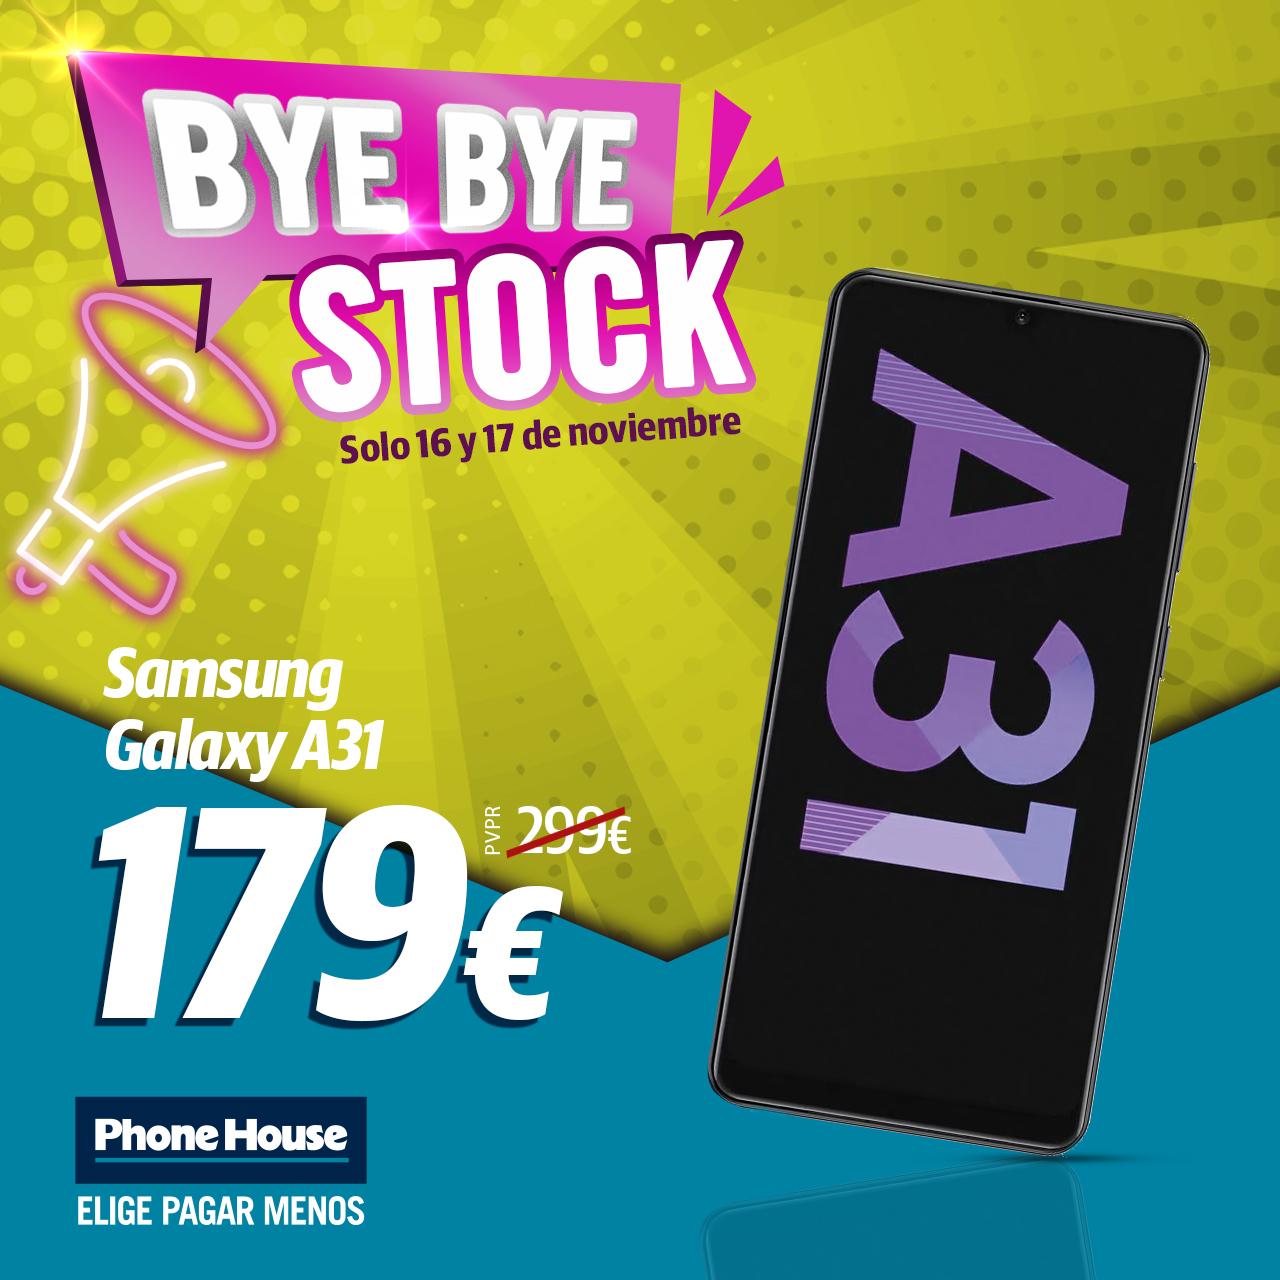 Rrss Bye Stock Prioridad 2 Smartphones